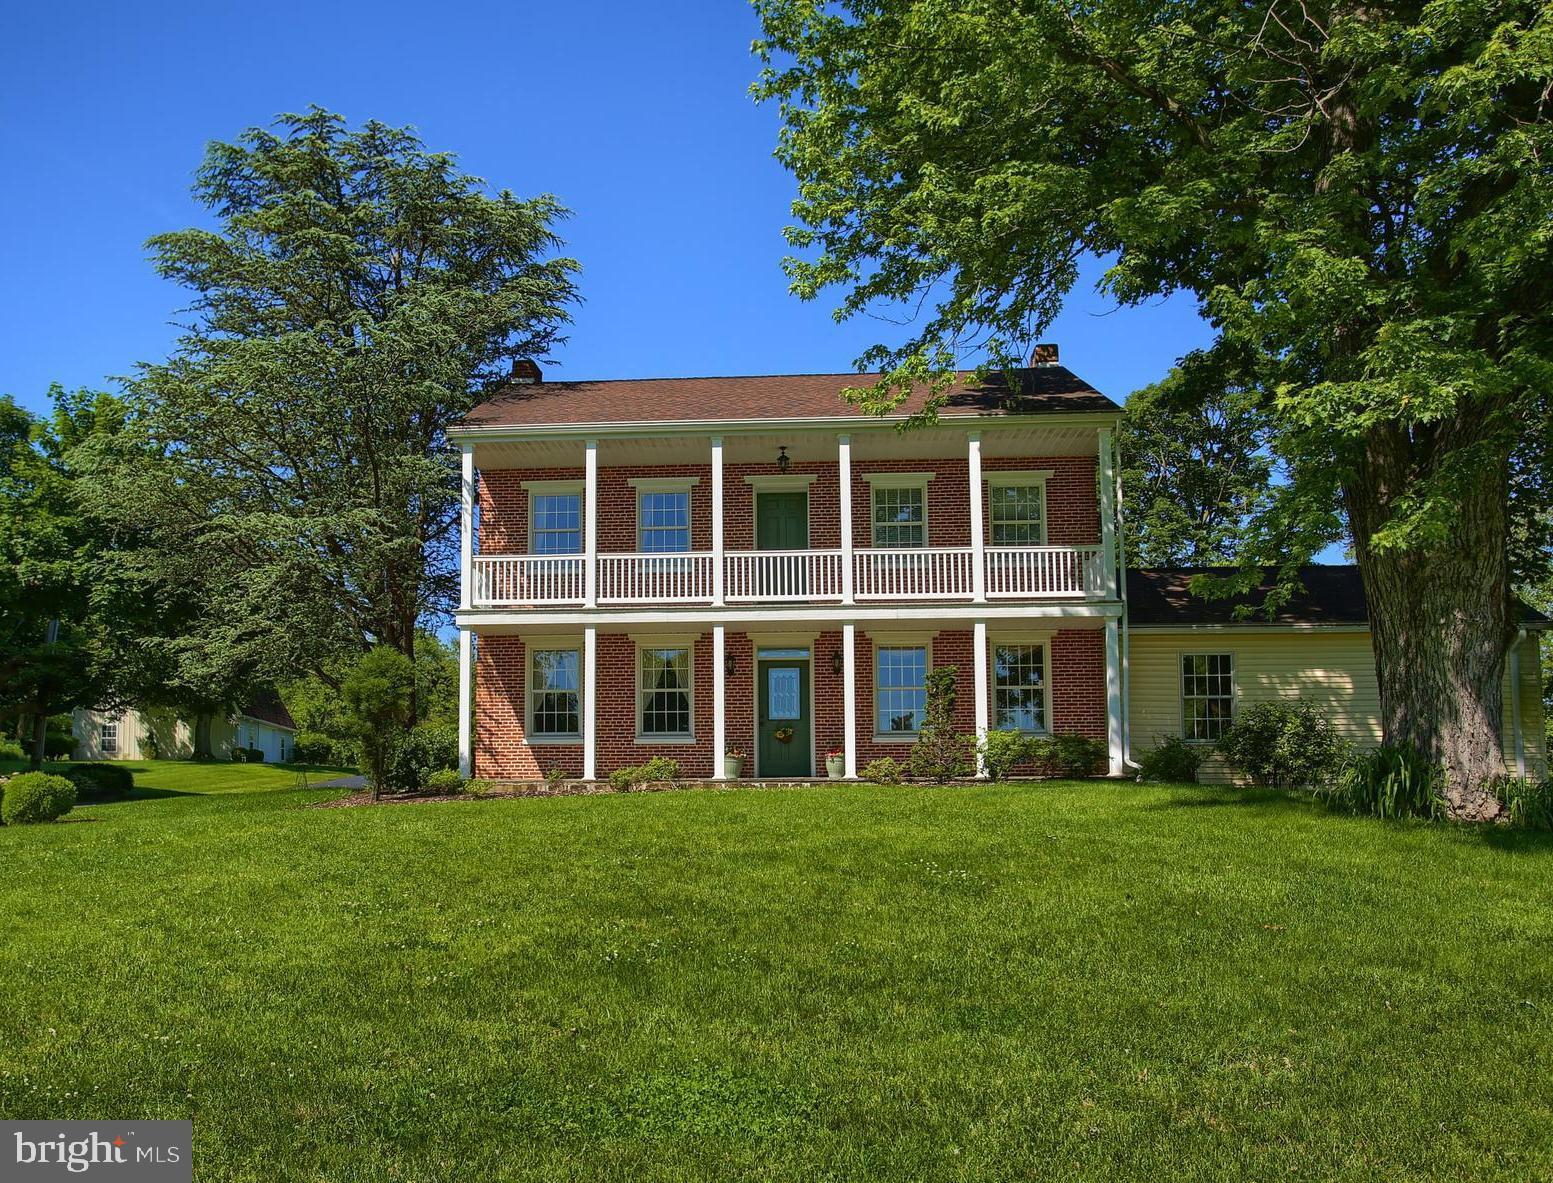 502 BURNT HOUSE ROAD, CARLISLE, PA 17015